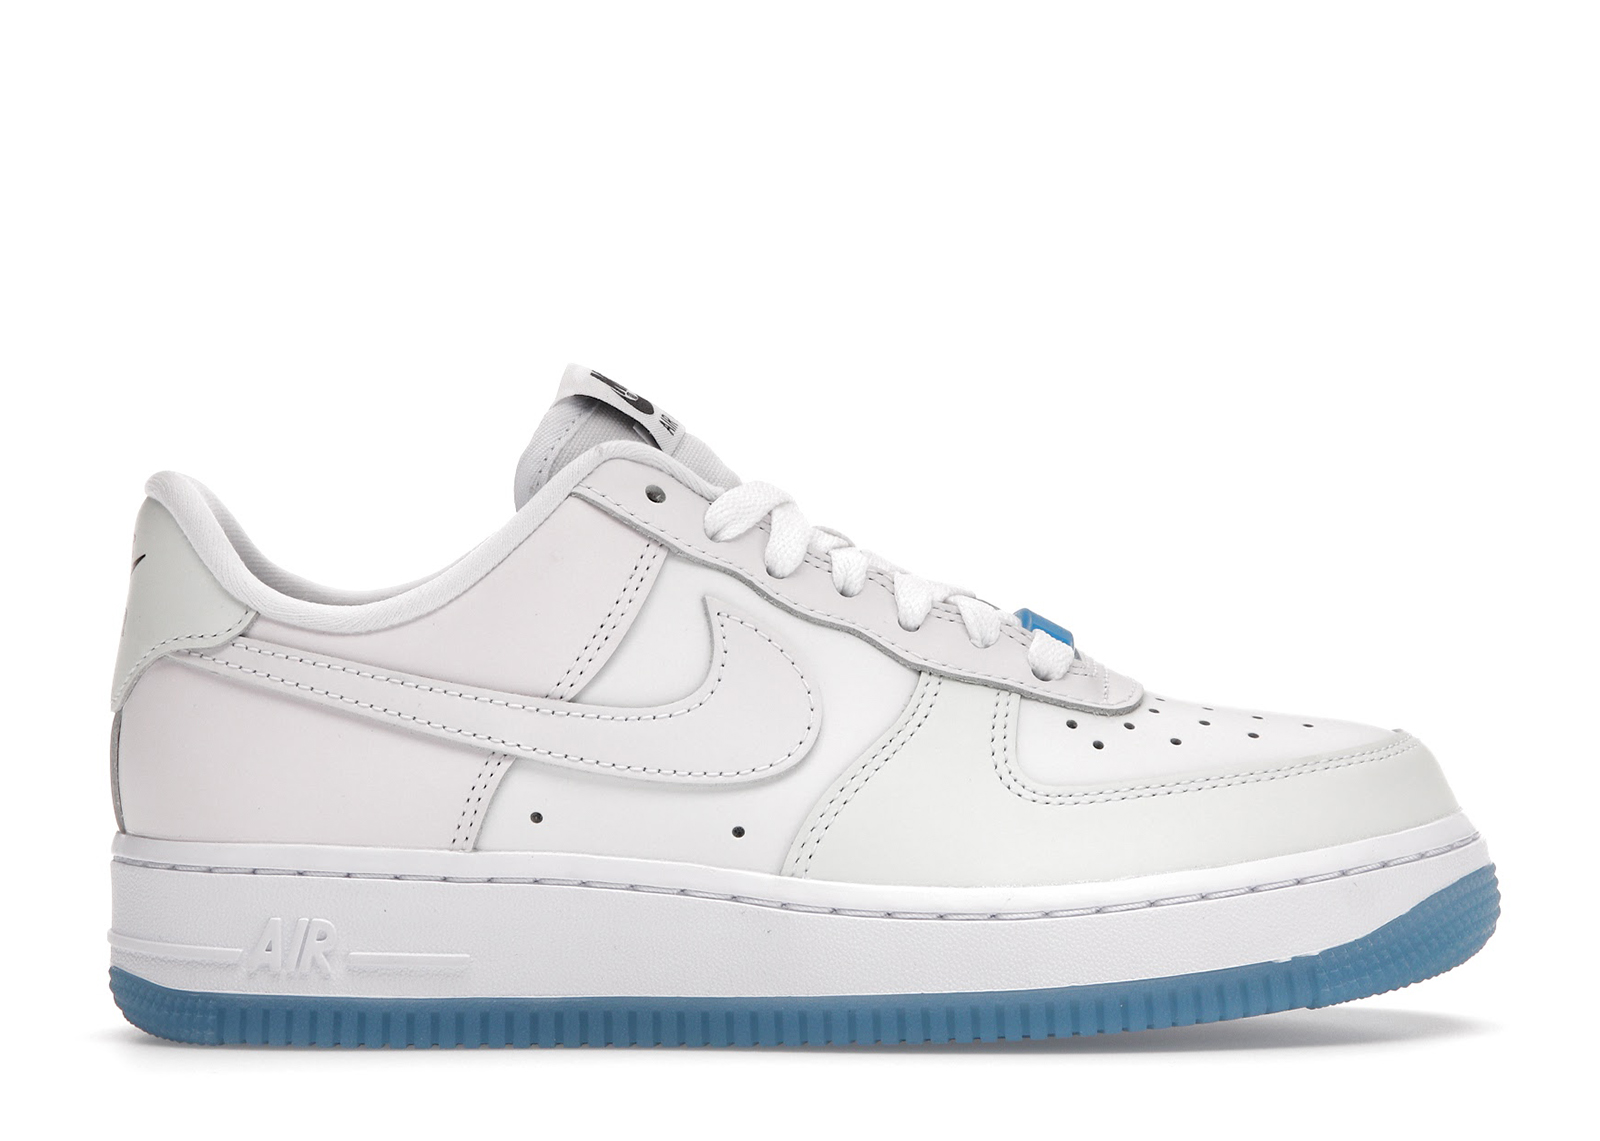 Acquista Nike Air Force Scarpe e sneakers deadstock